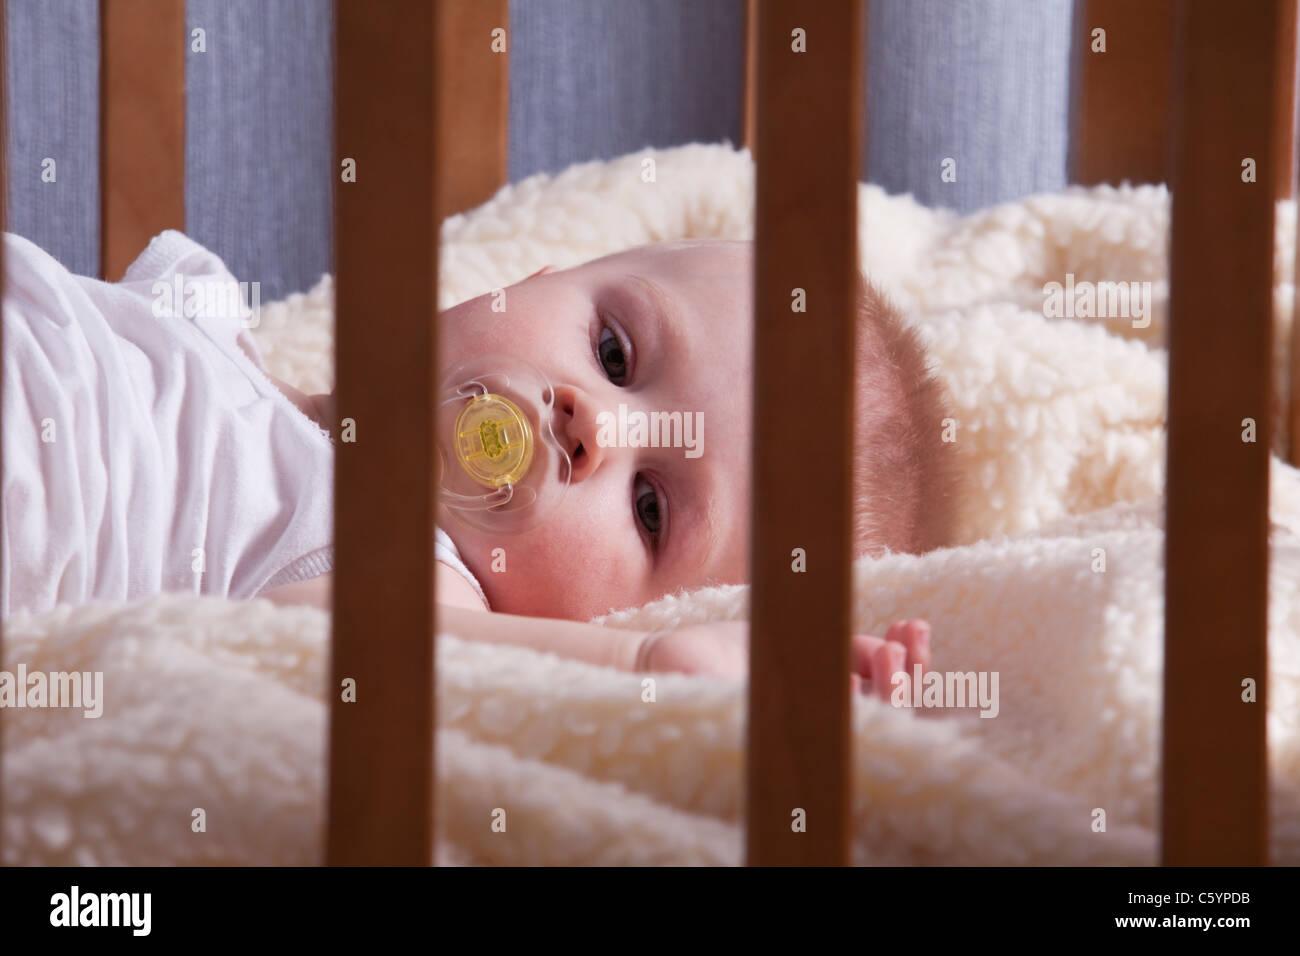 Russia, Voronezh, baby boy (12-17 months) in crib - Stock Image